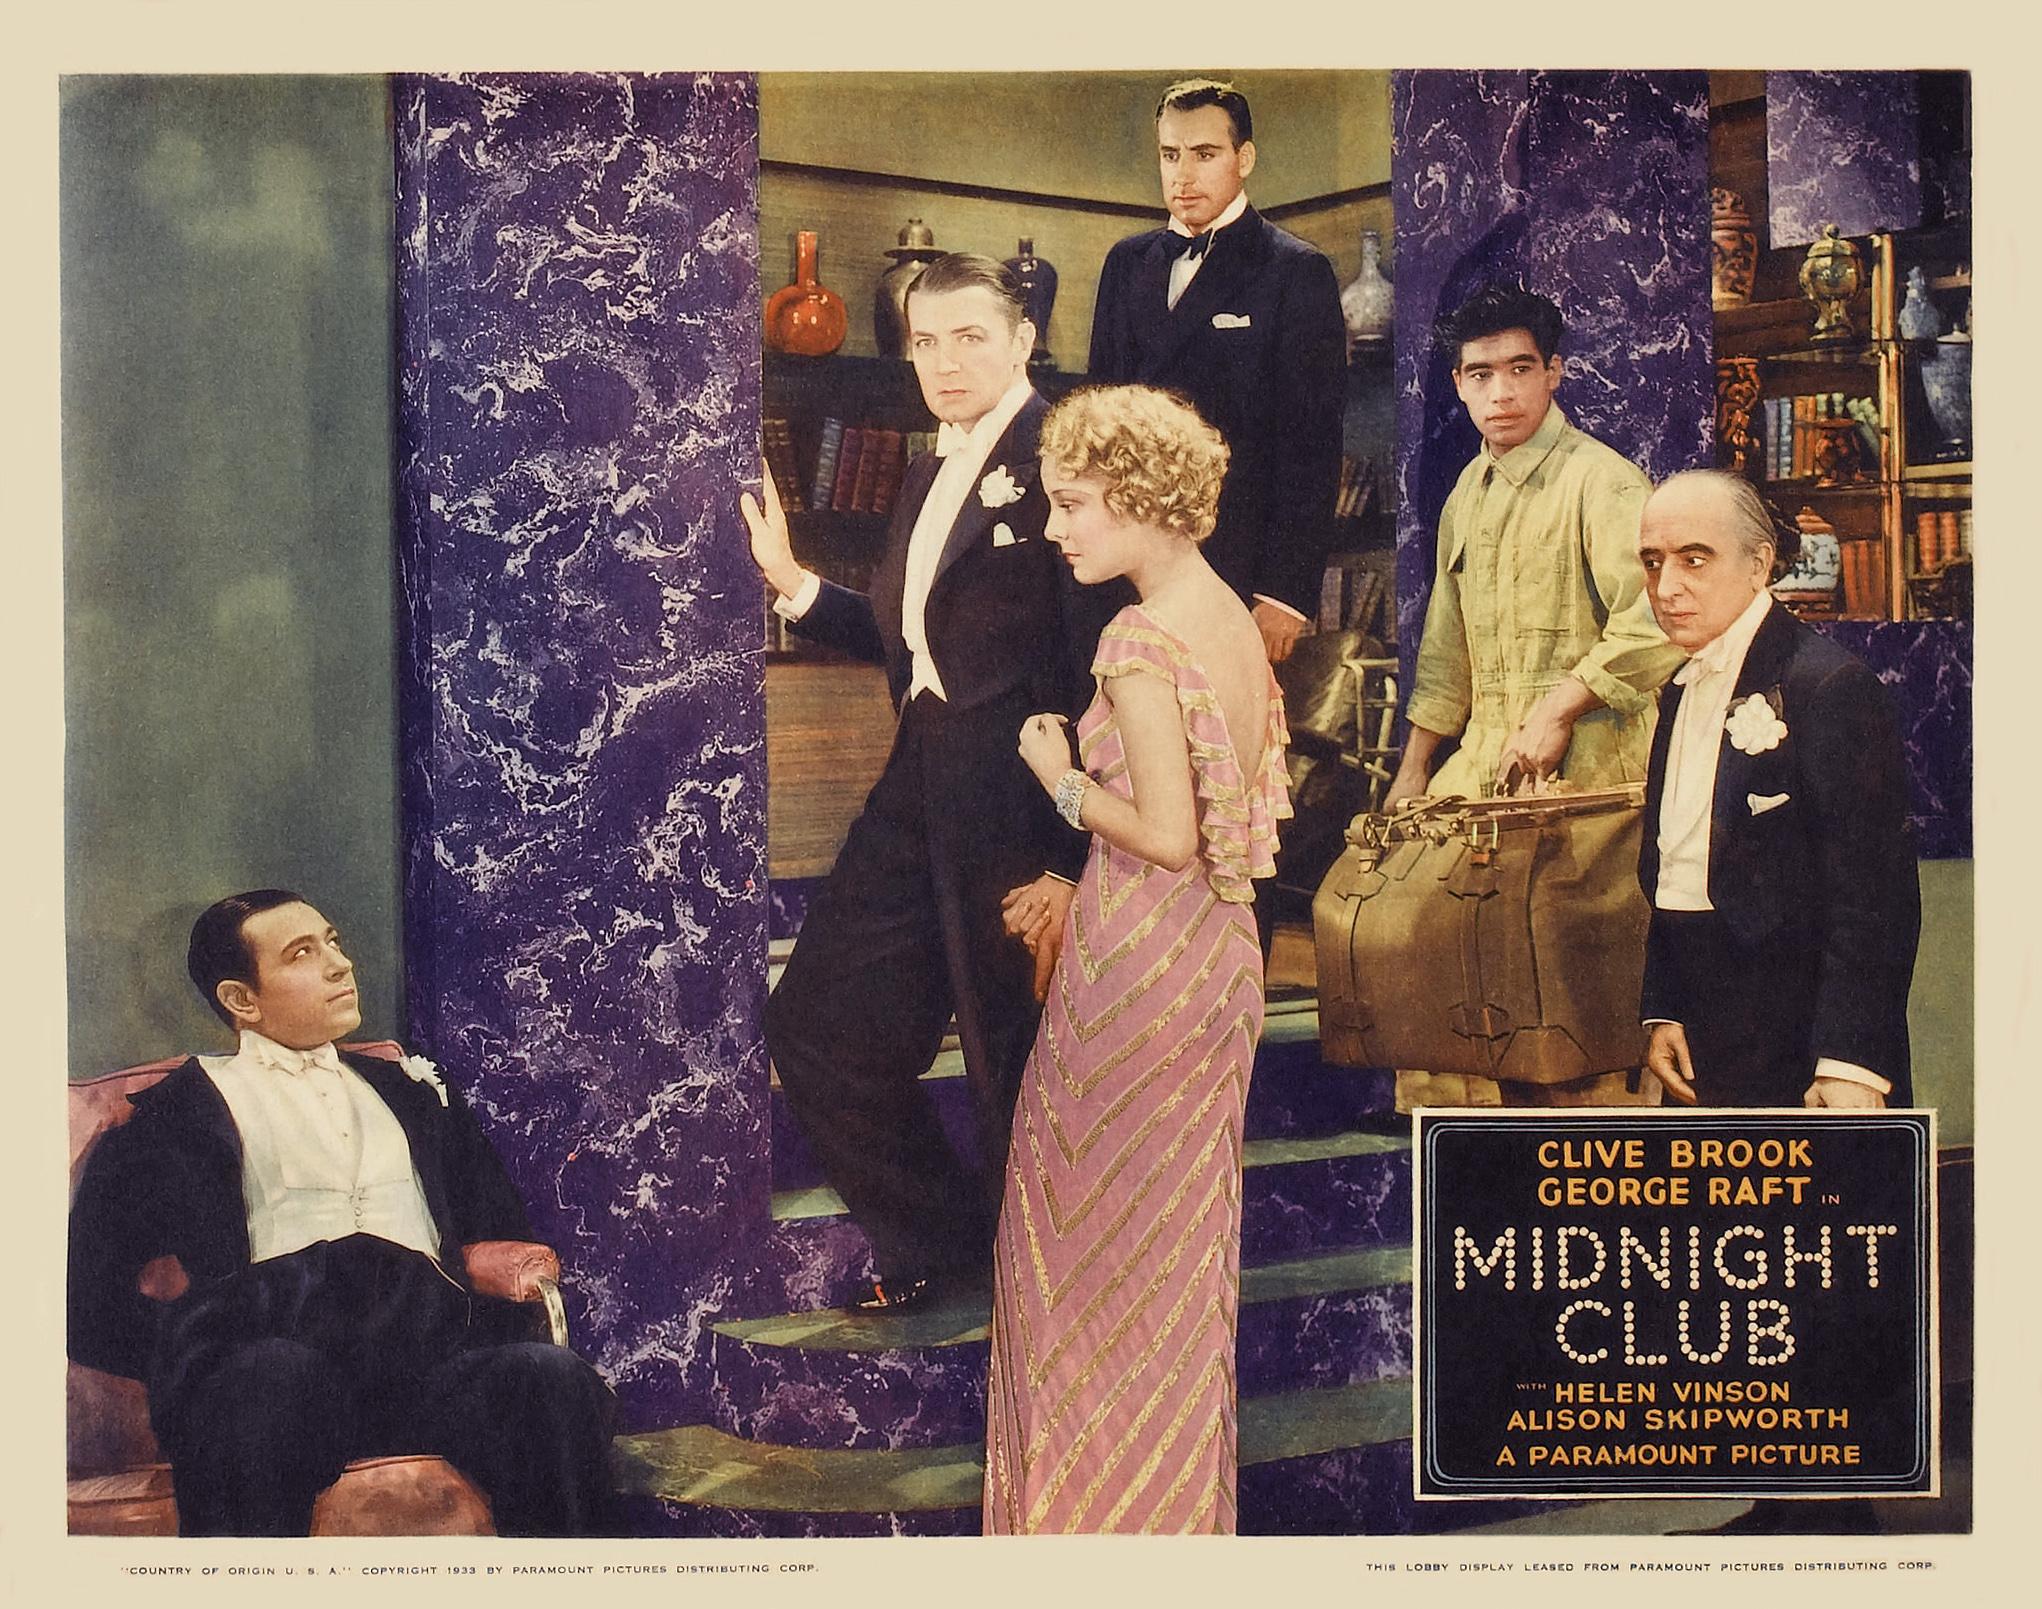 Midnight Club (1933)